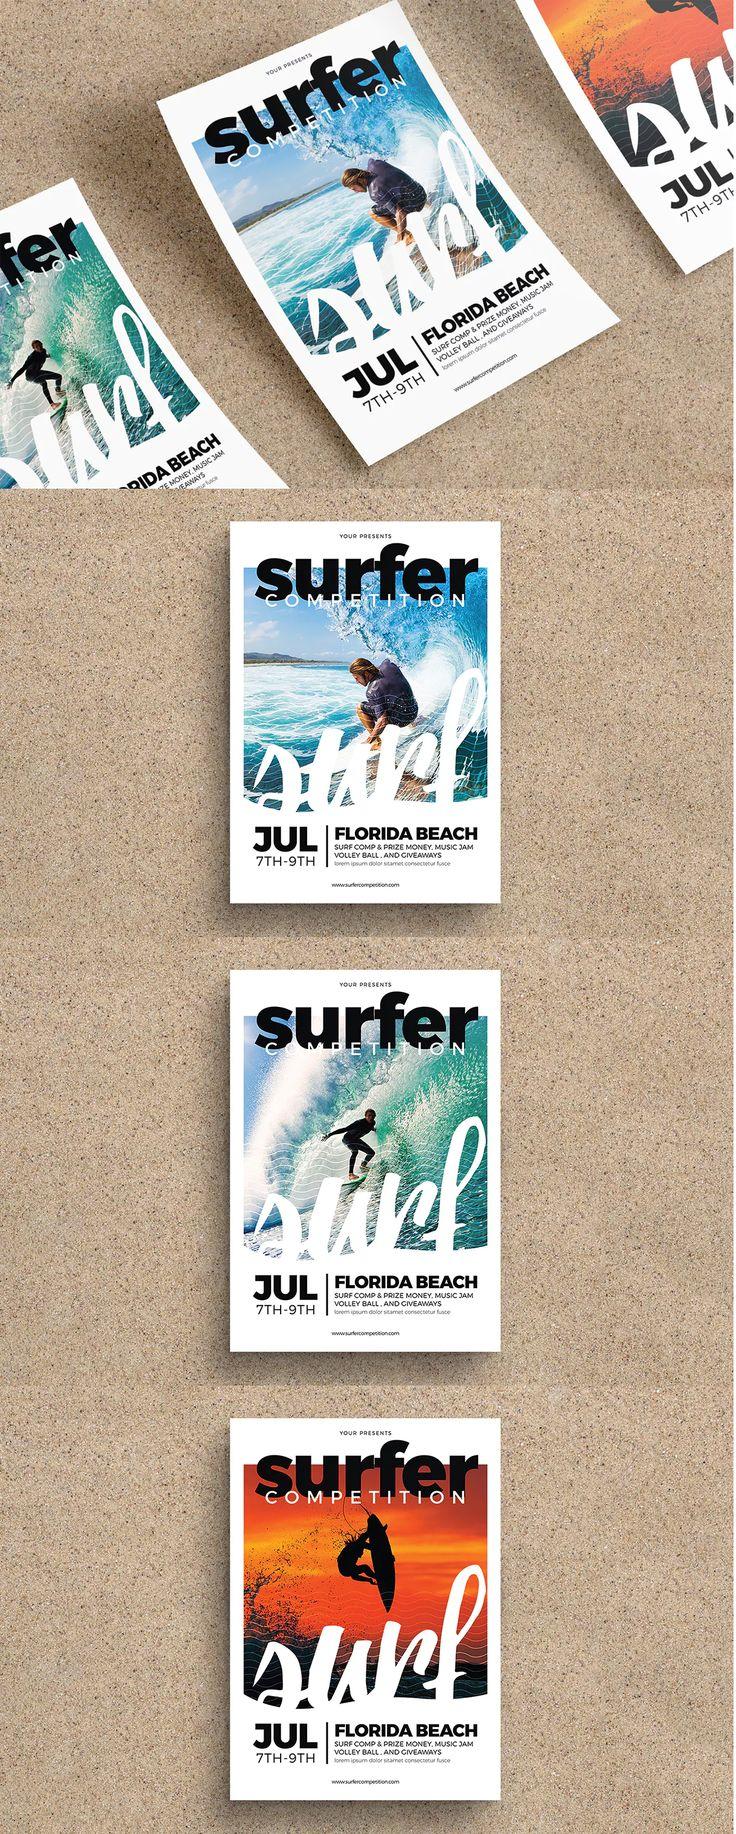 Surfing Flyer Template AI, PSD - A4